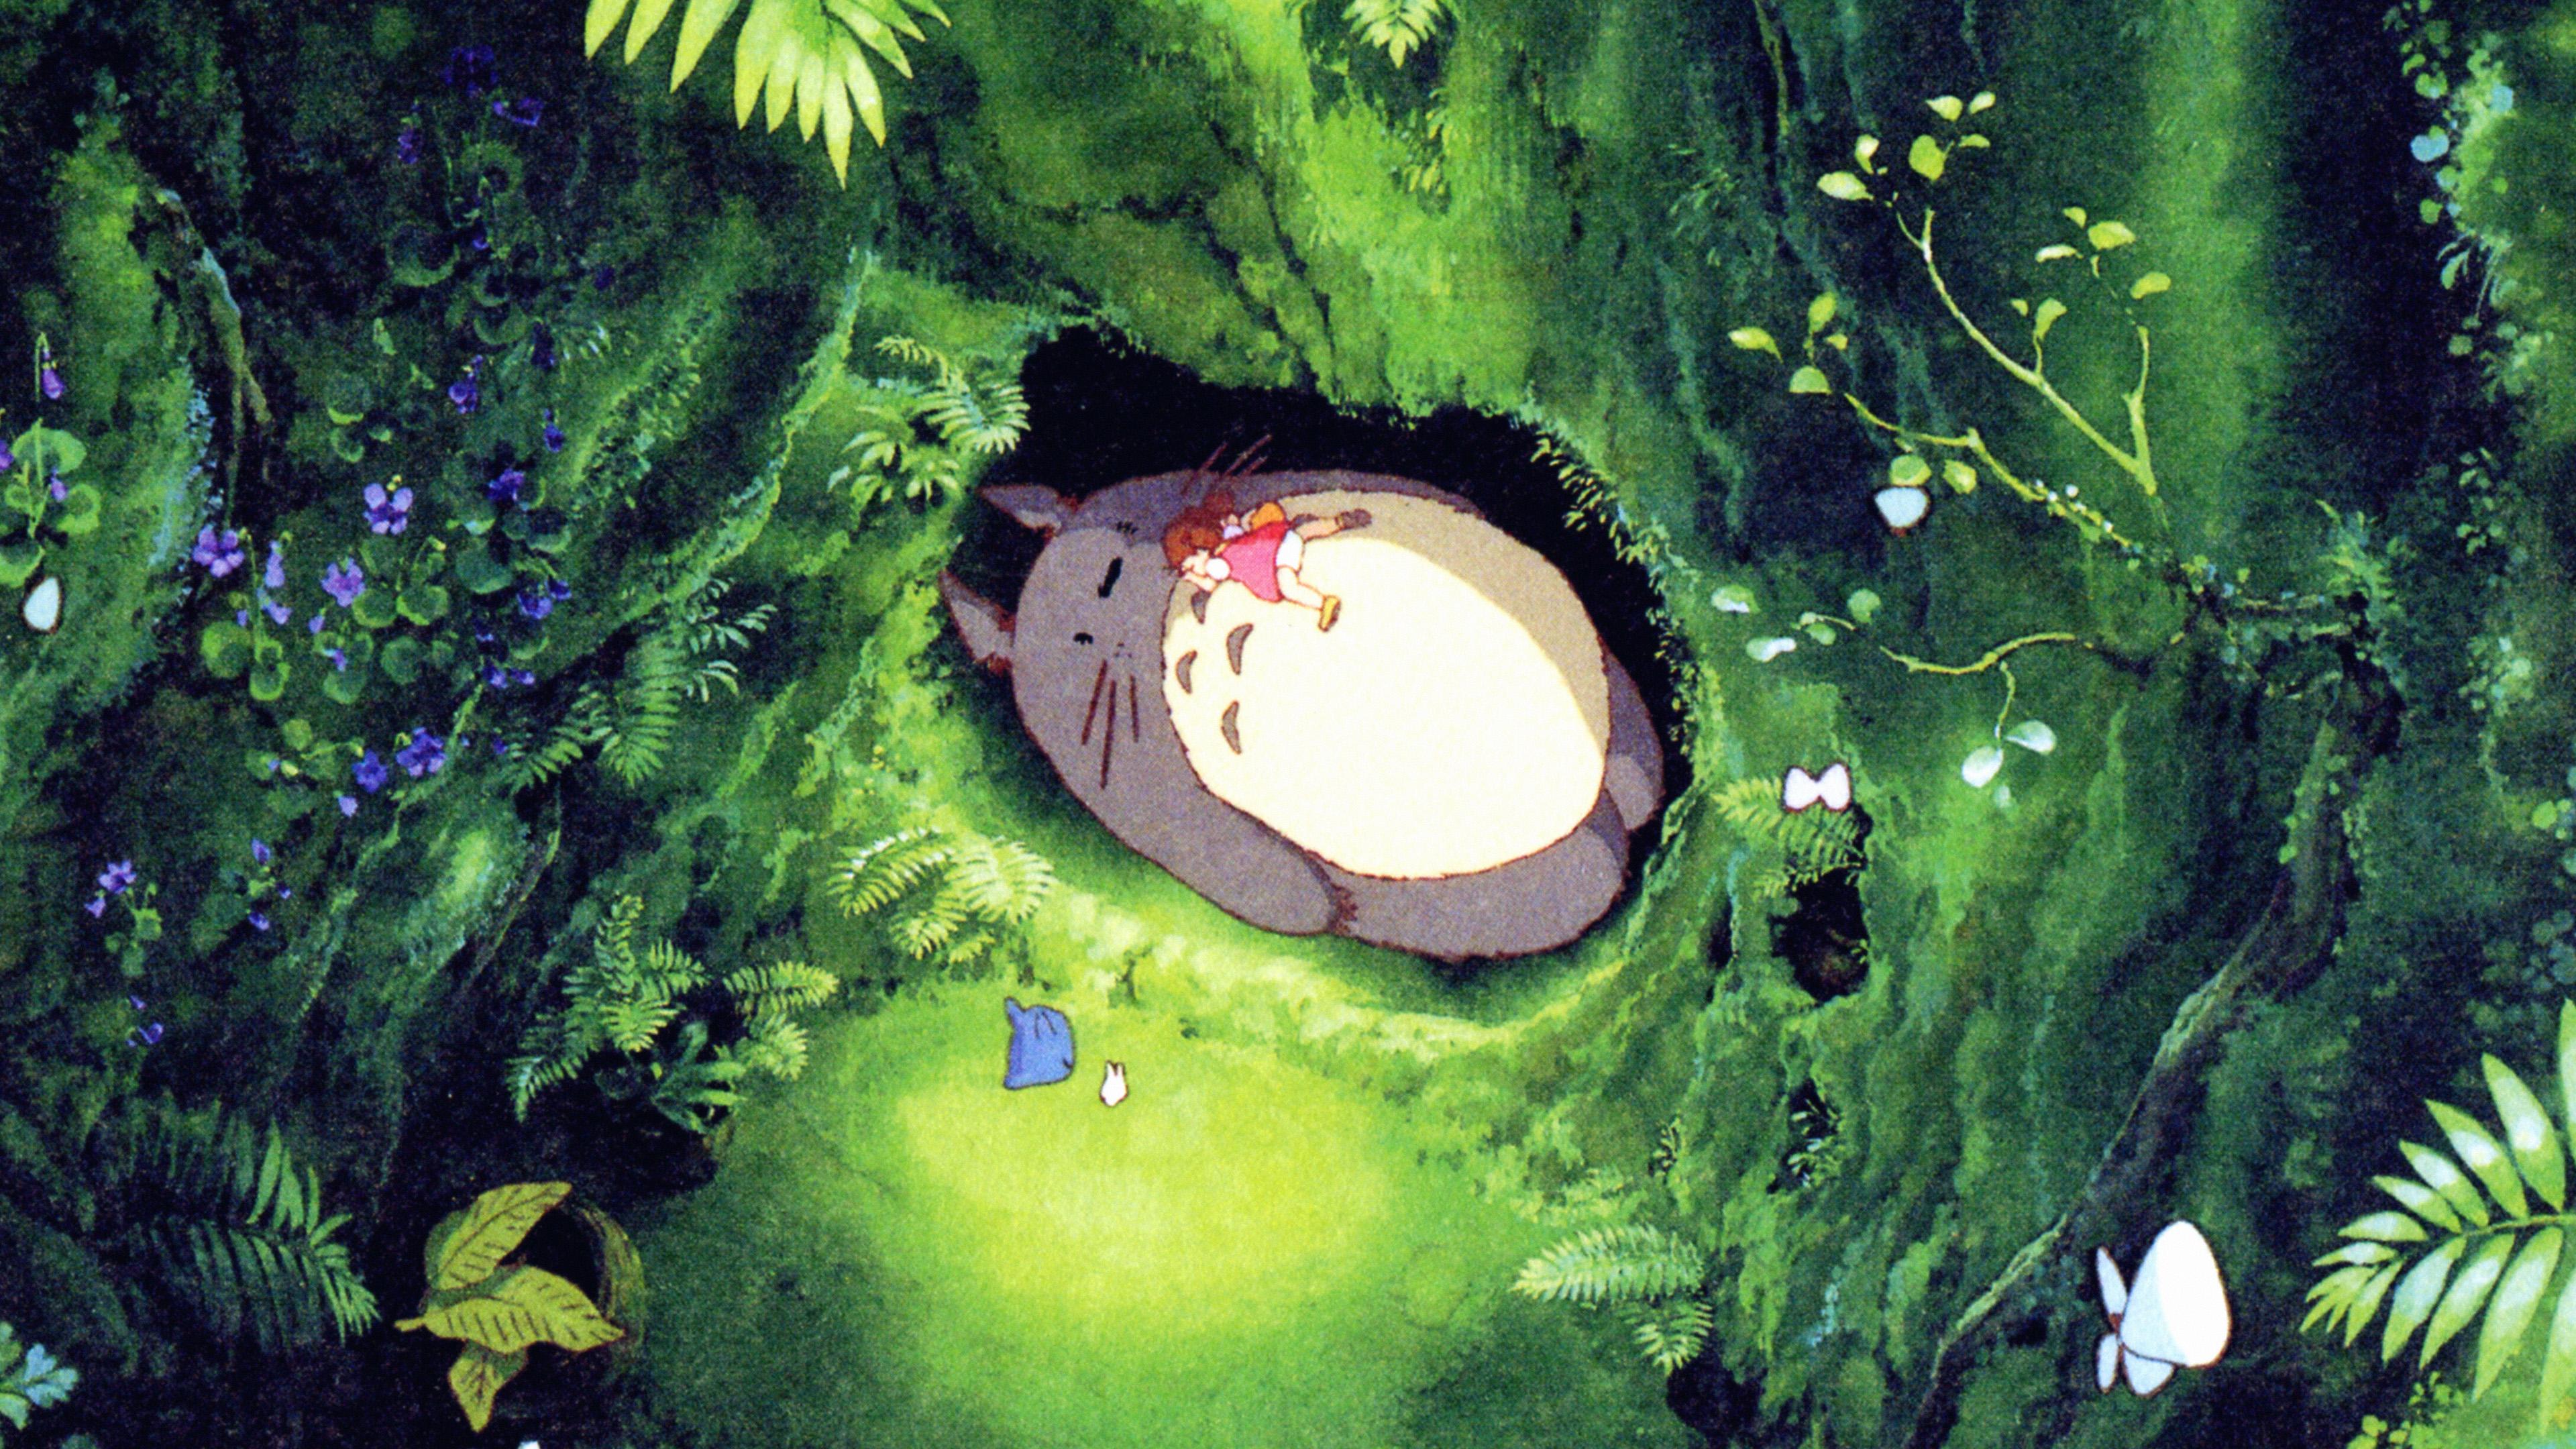 Ap14 Japan Totoro Art Green Anime Illustration Wallpaper